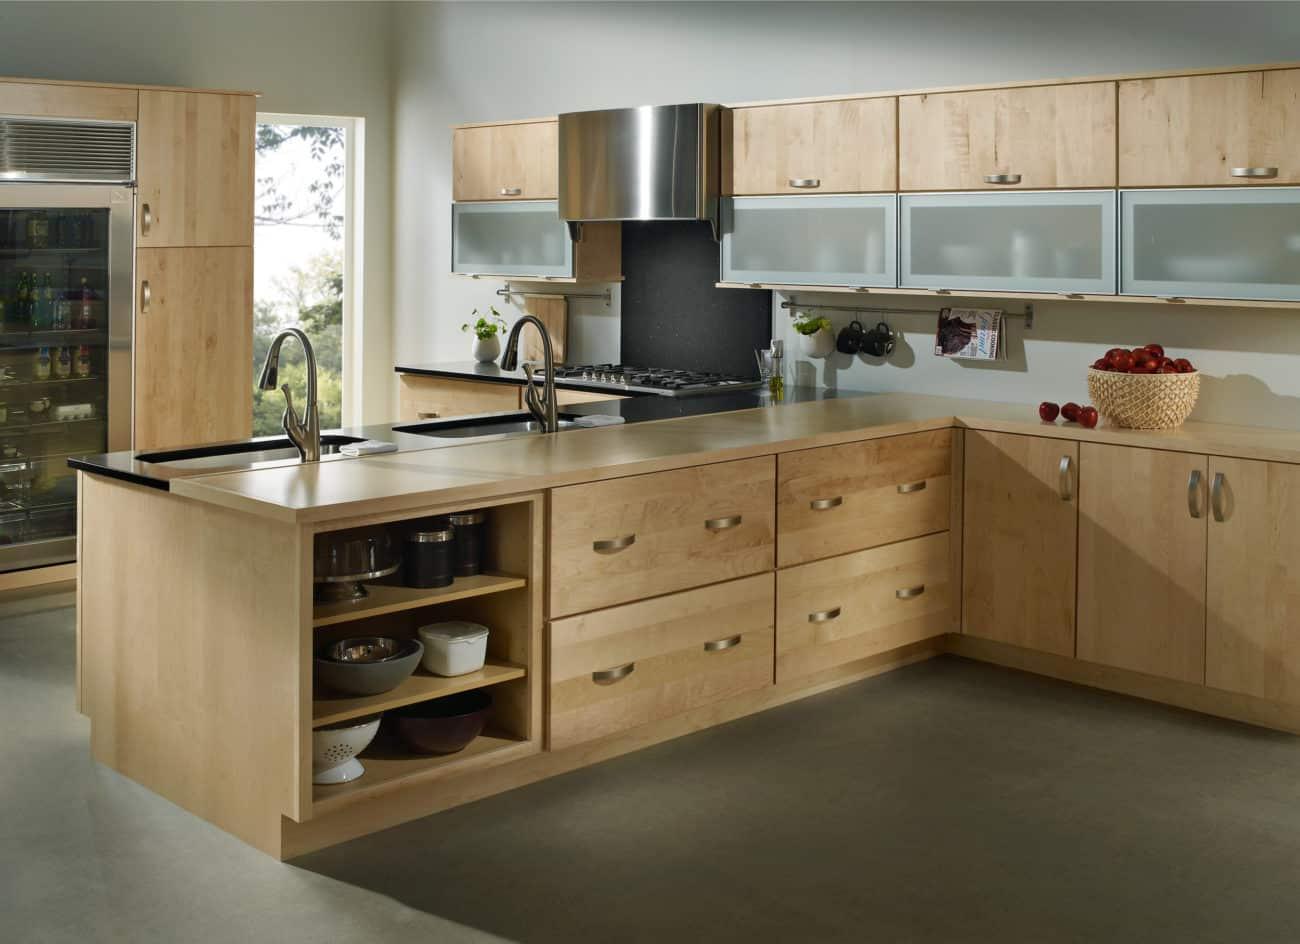 light wood kitchen cabinets light kitchen cabinets Light Wood Kitchen Cabinets